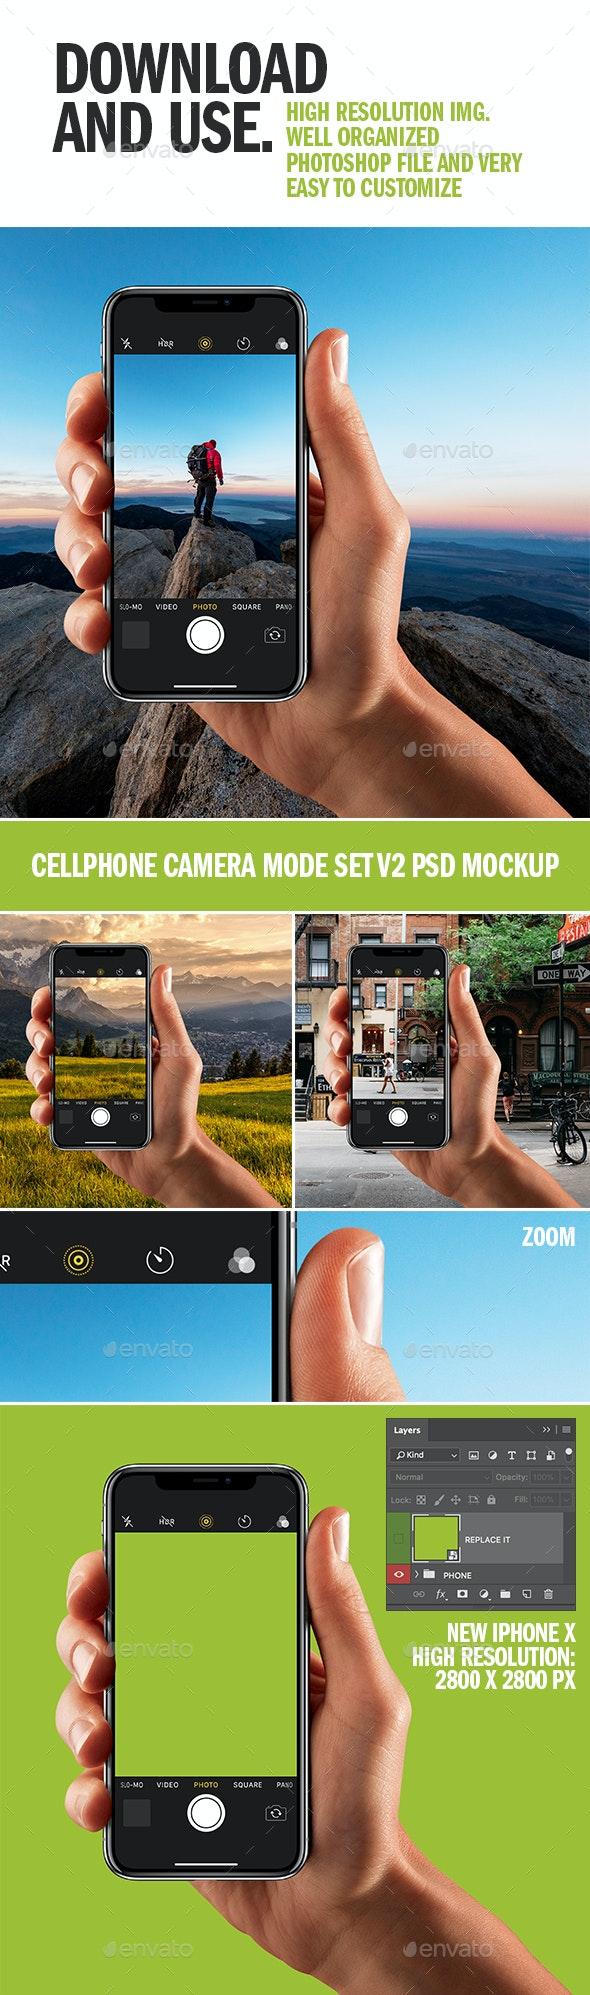 Cellphone Camera Mode Set v2 PSD Mockup - Product Mock-Ups Graphics